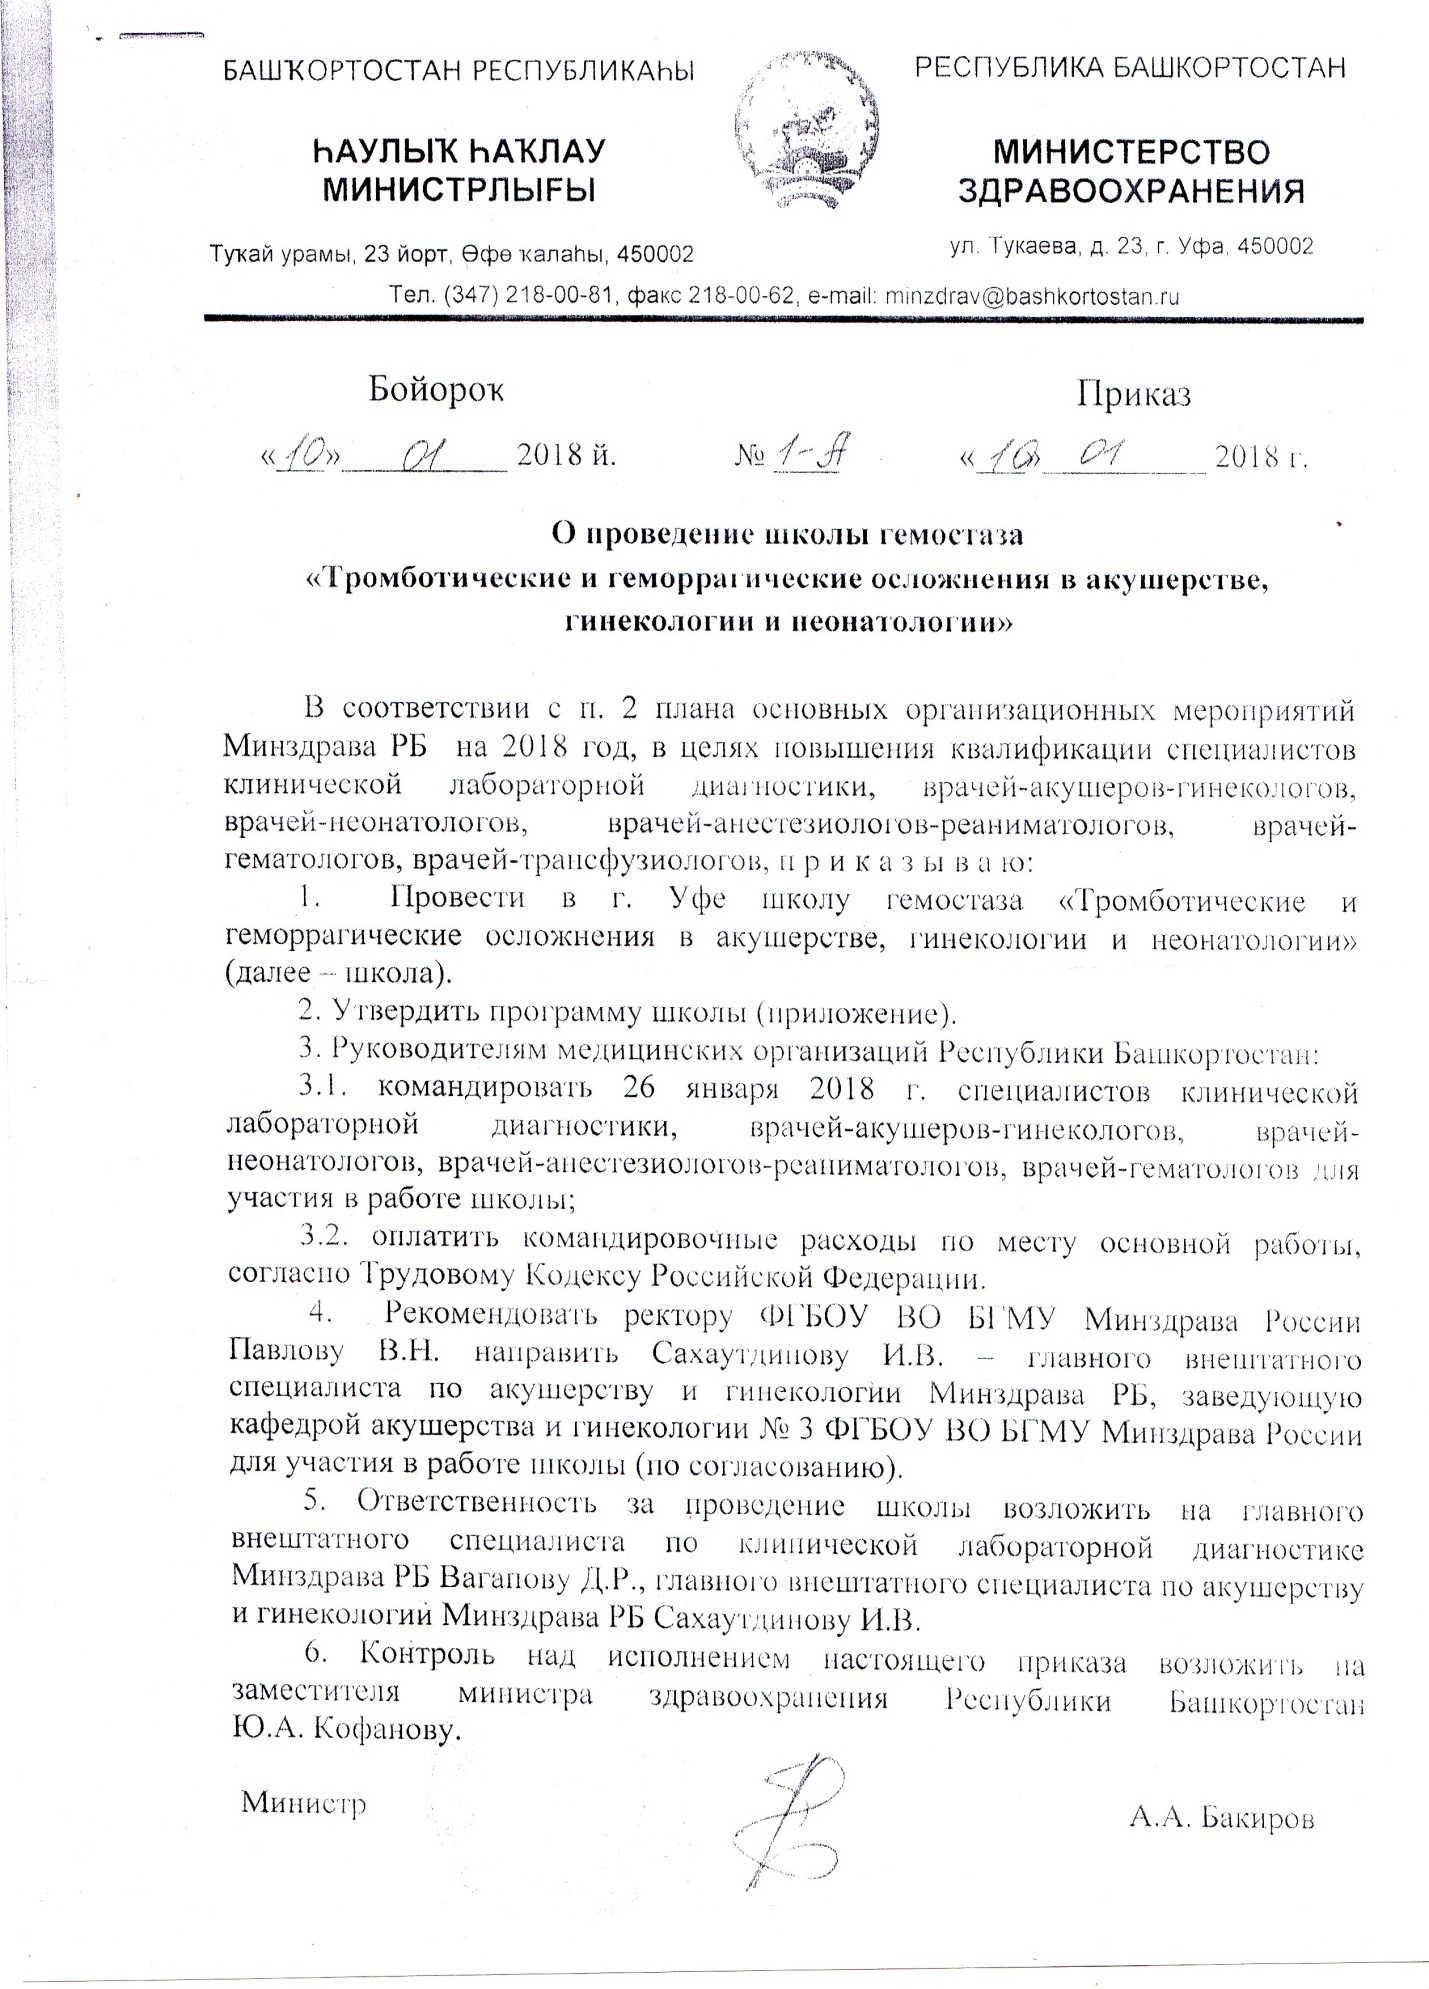 HemostasisSchool-Ufa-order-w